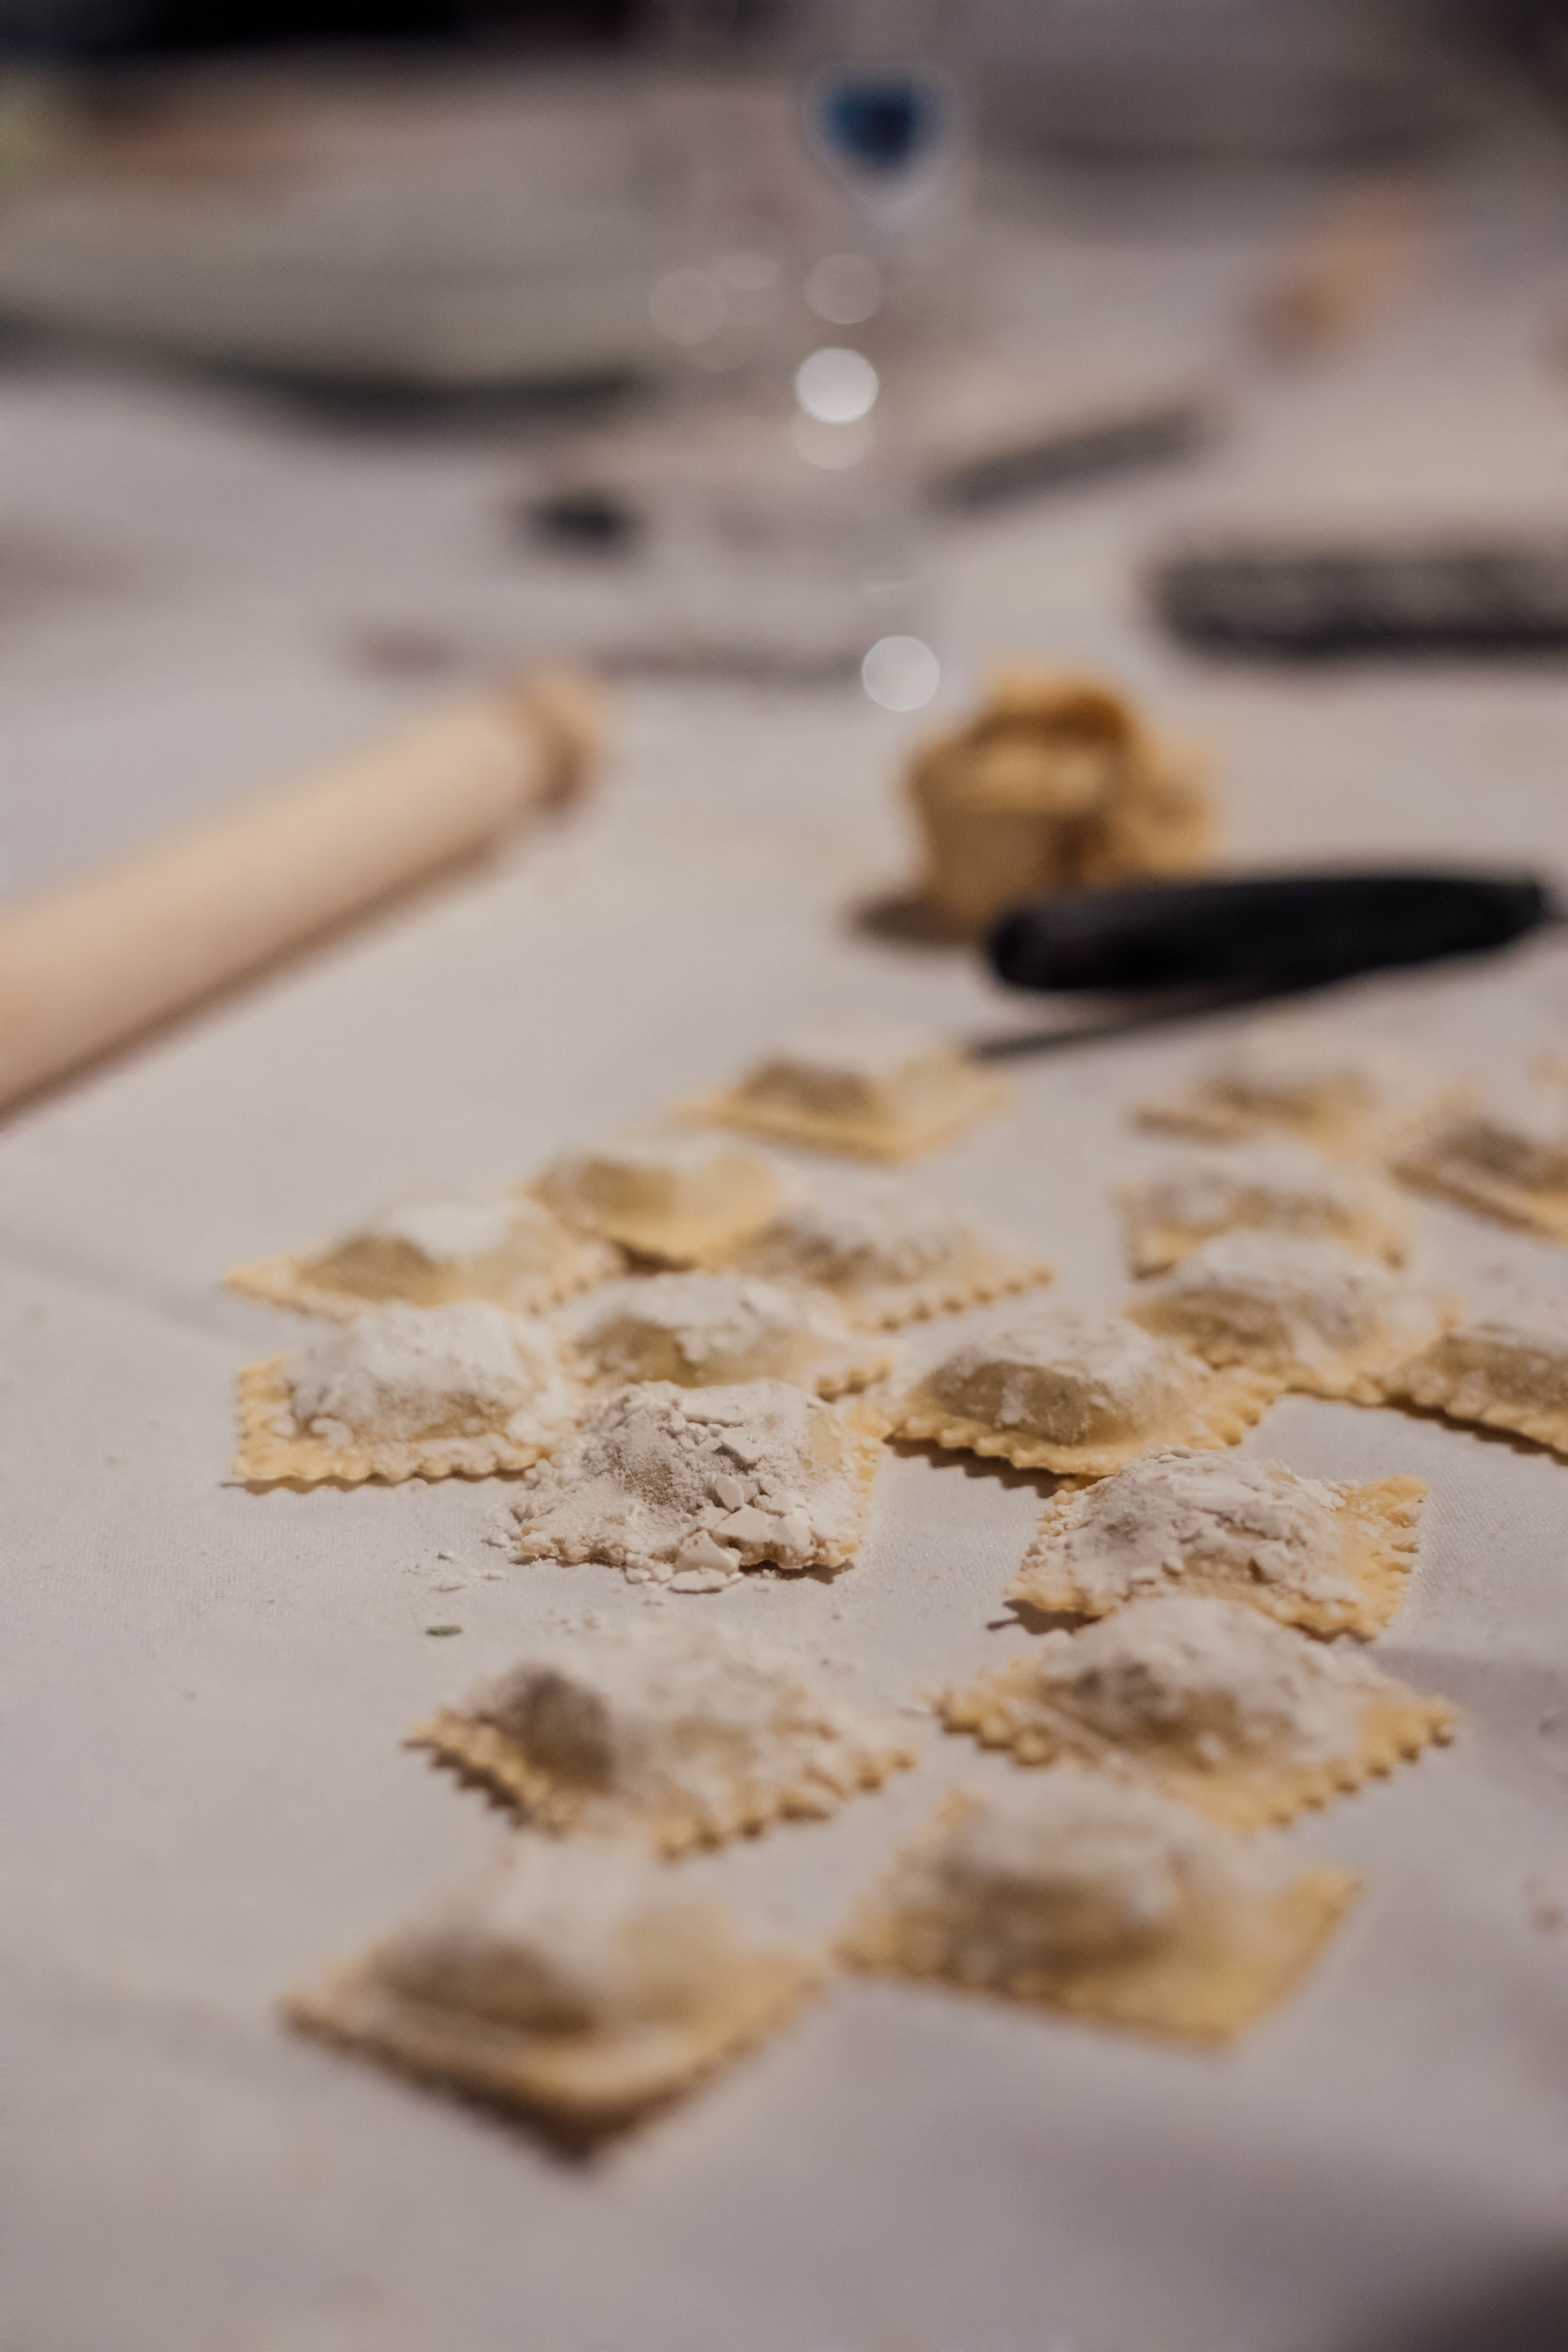 Liguria food guide Italian cuisine ravioli pasta